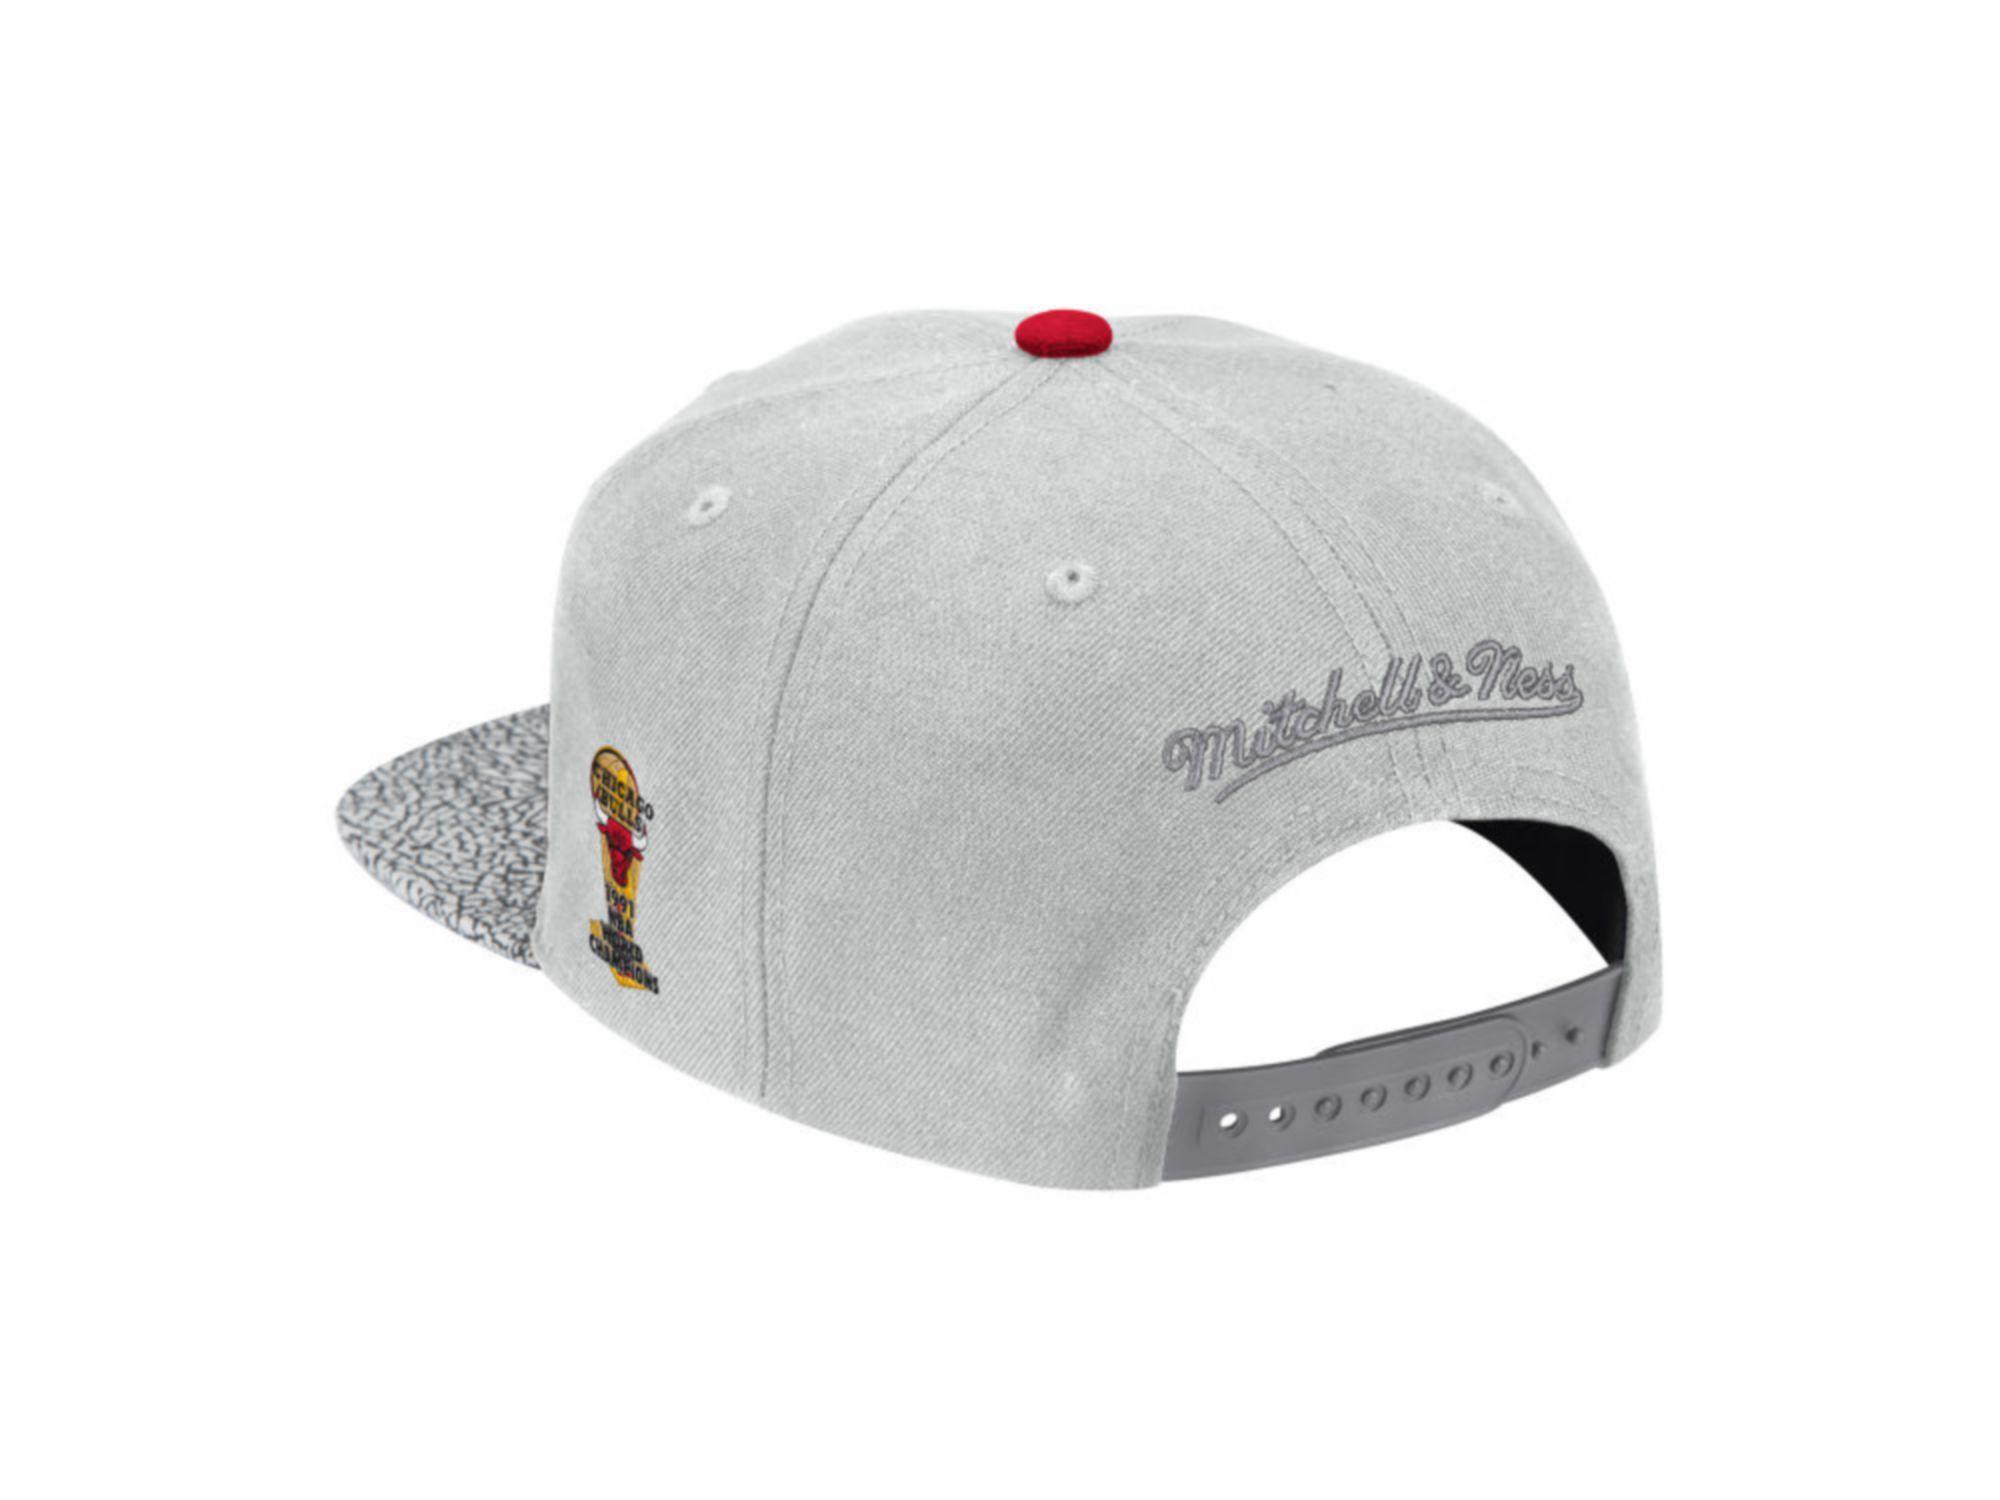 Mitchell & Ness Chicago Bulls Cool Gray Print Snapback Cap & Reviews - NBA - Sports Fan Shop - Macy's